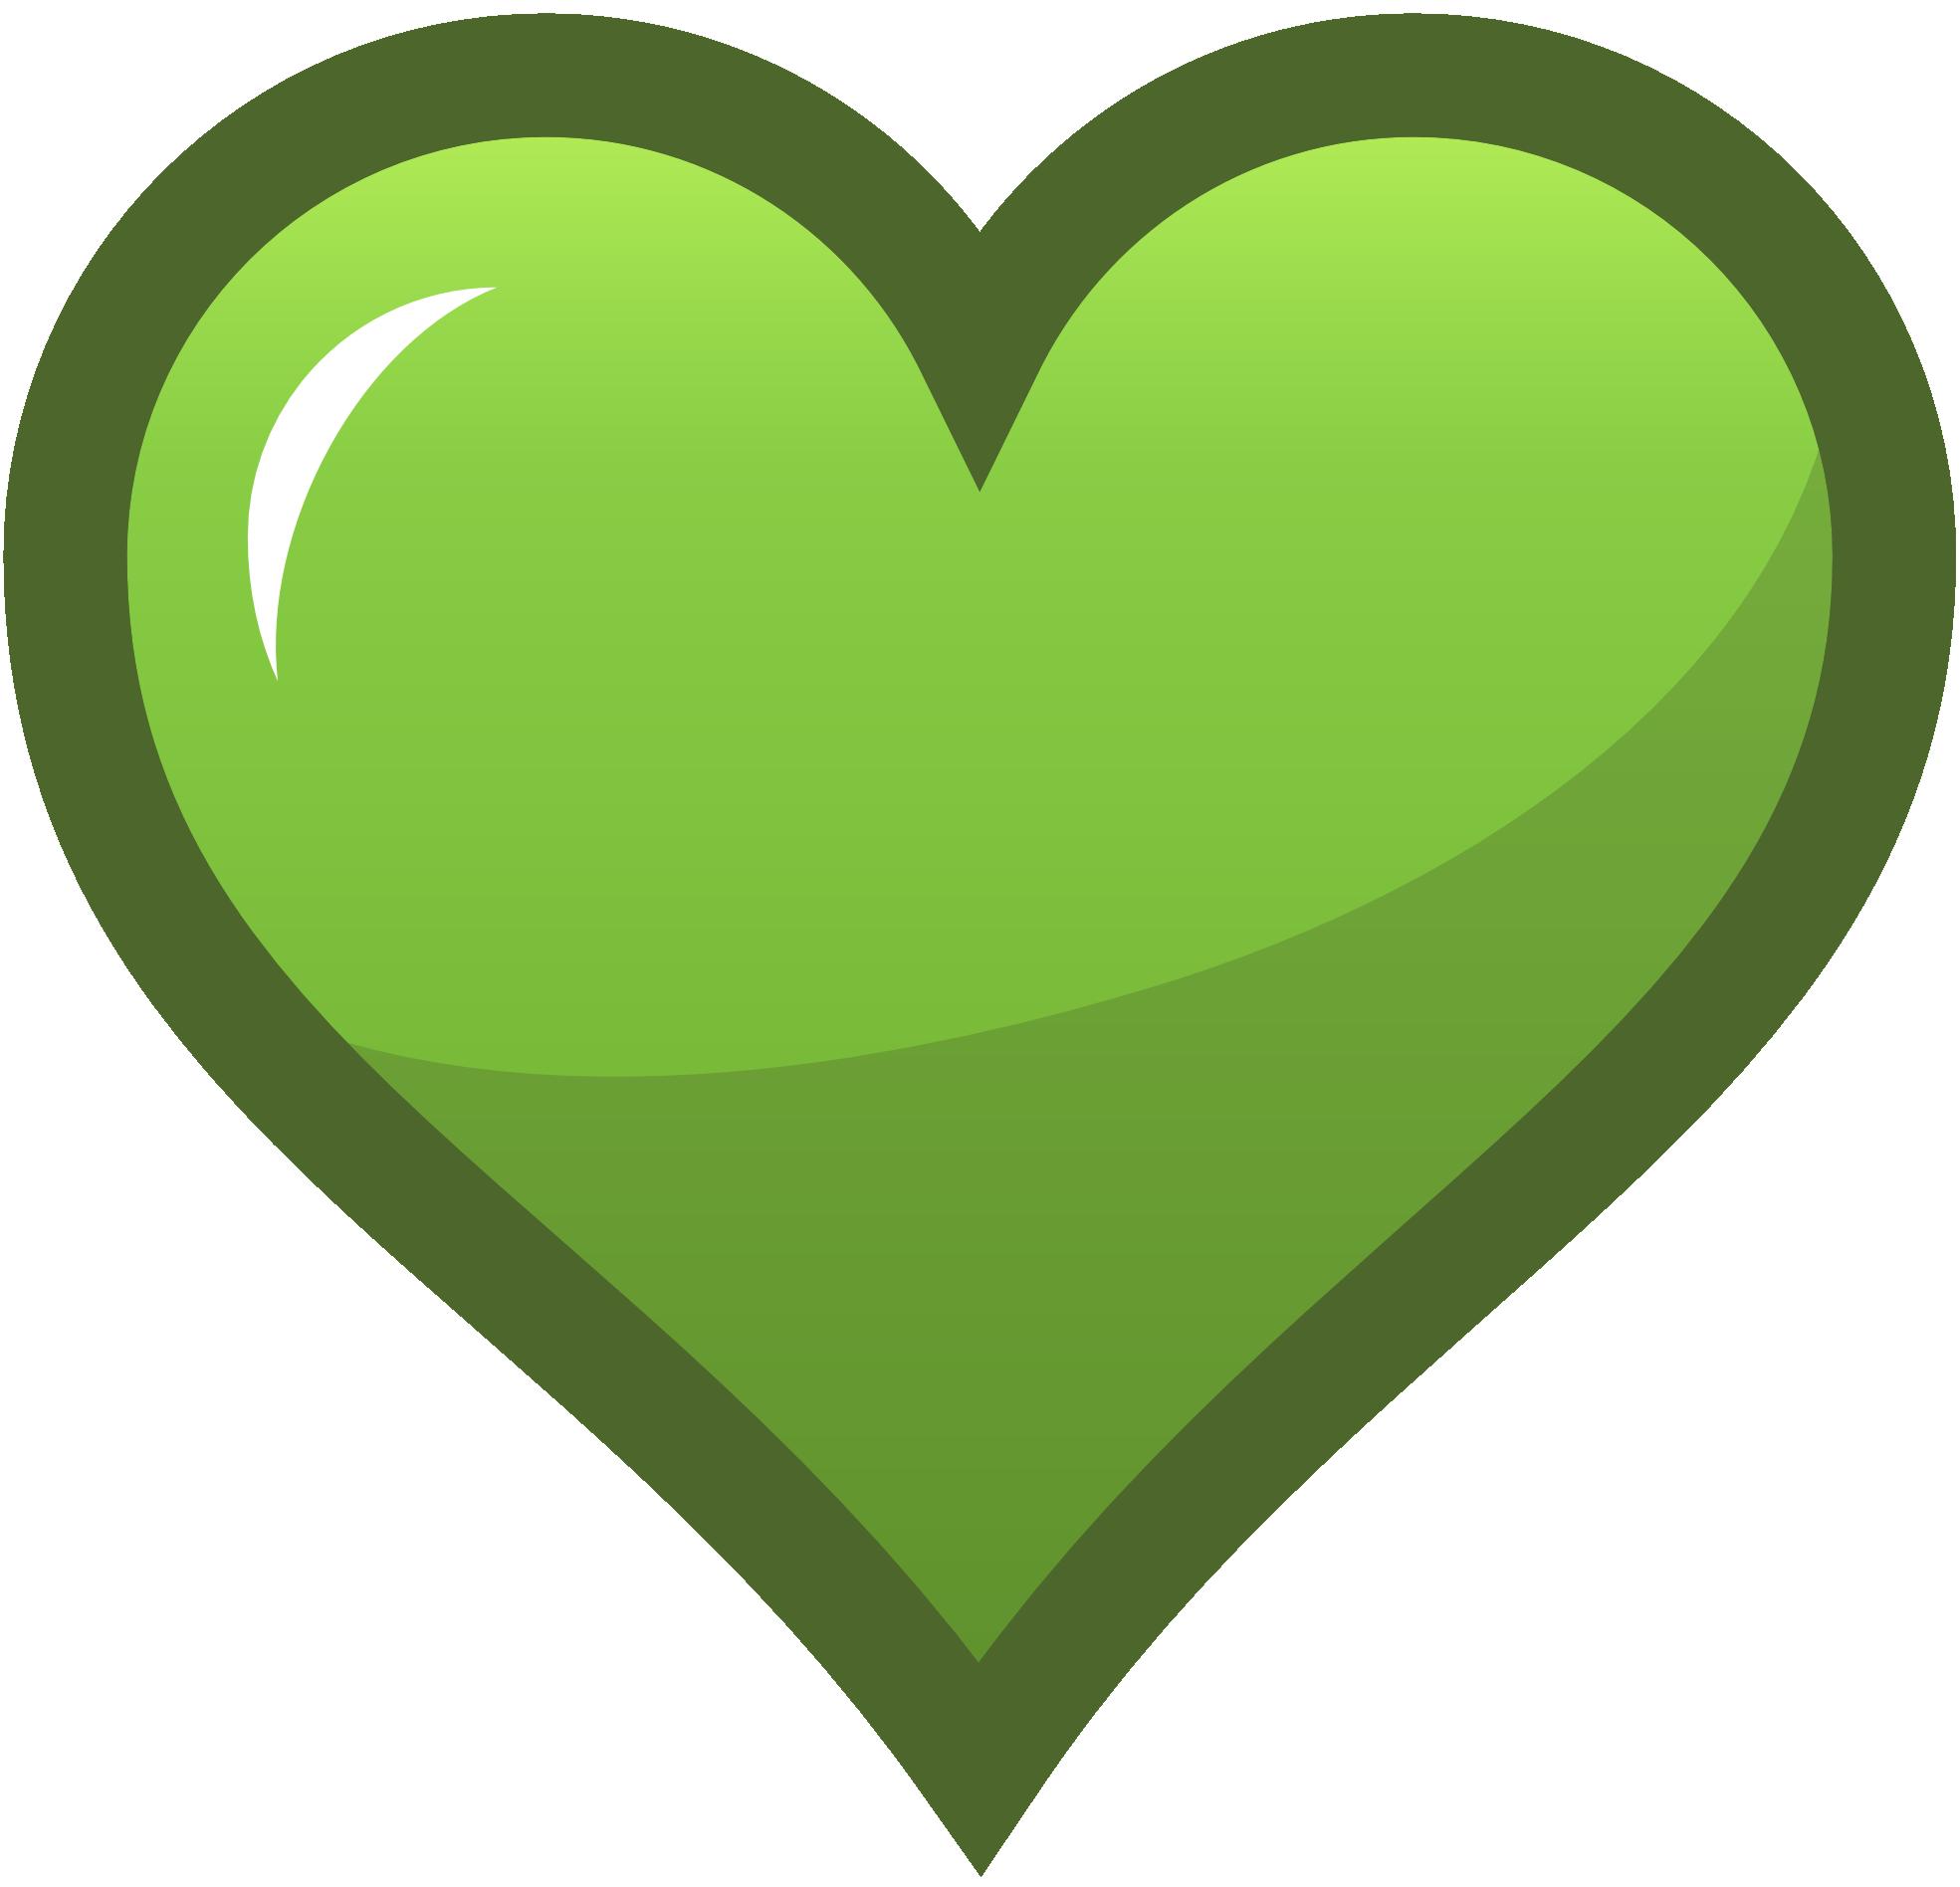 Yellowgreen heart icon ocal. Green clipart crayon